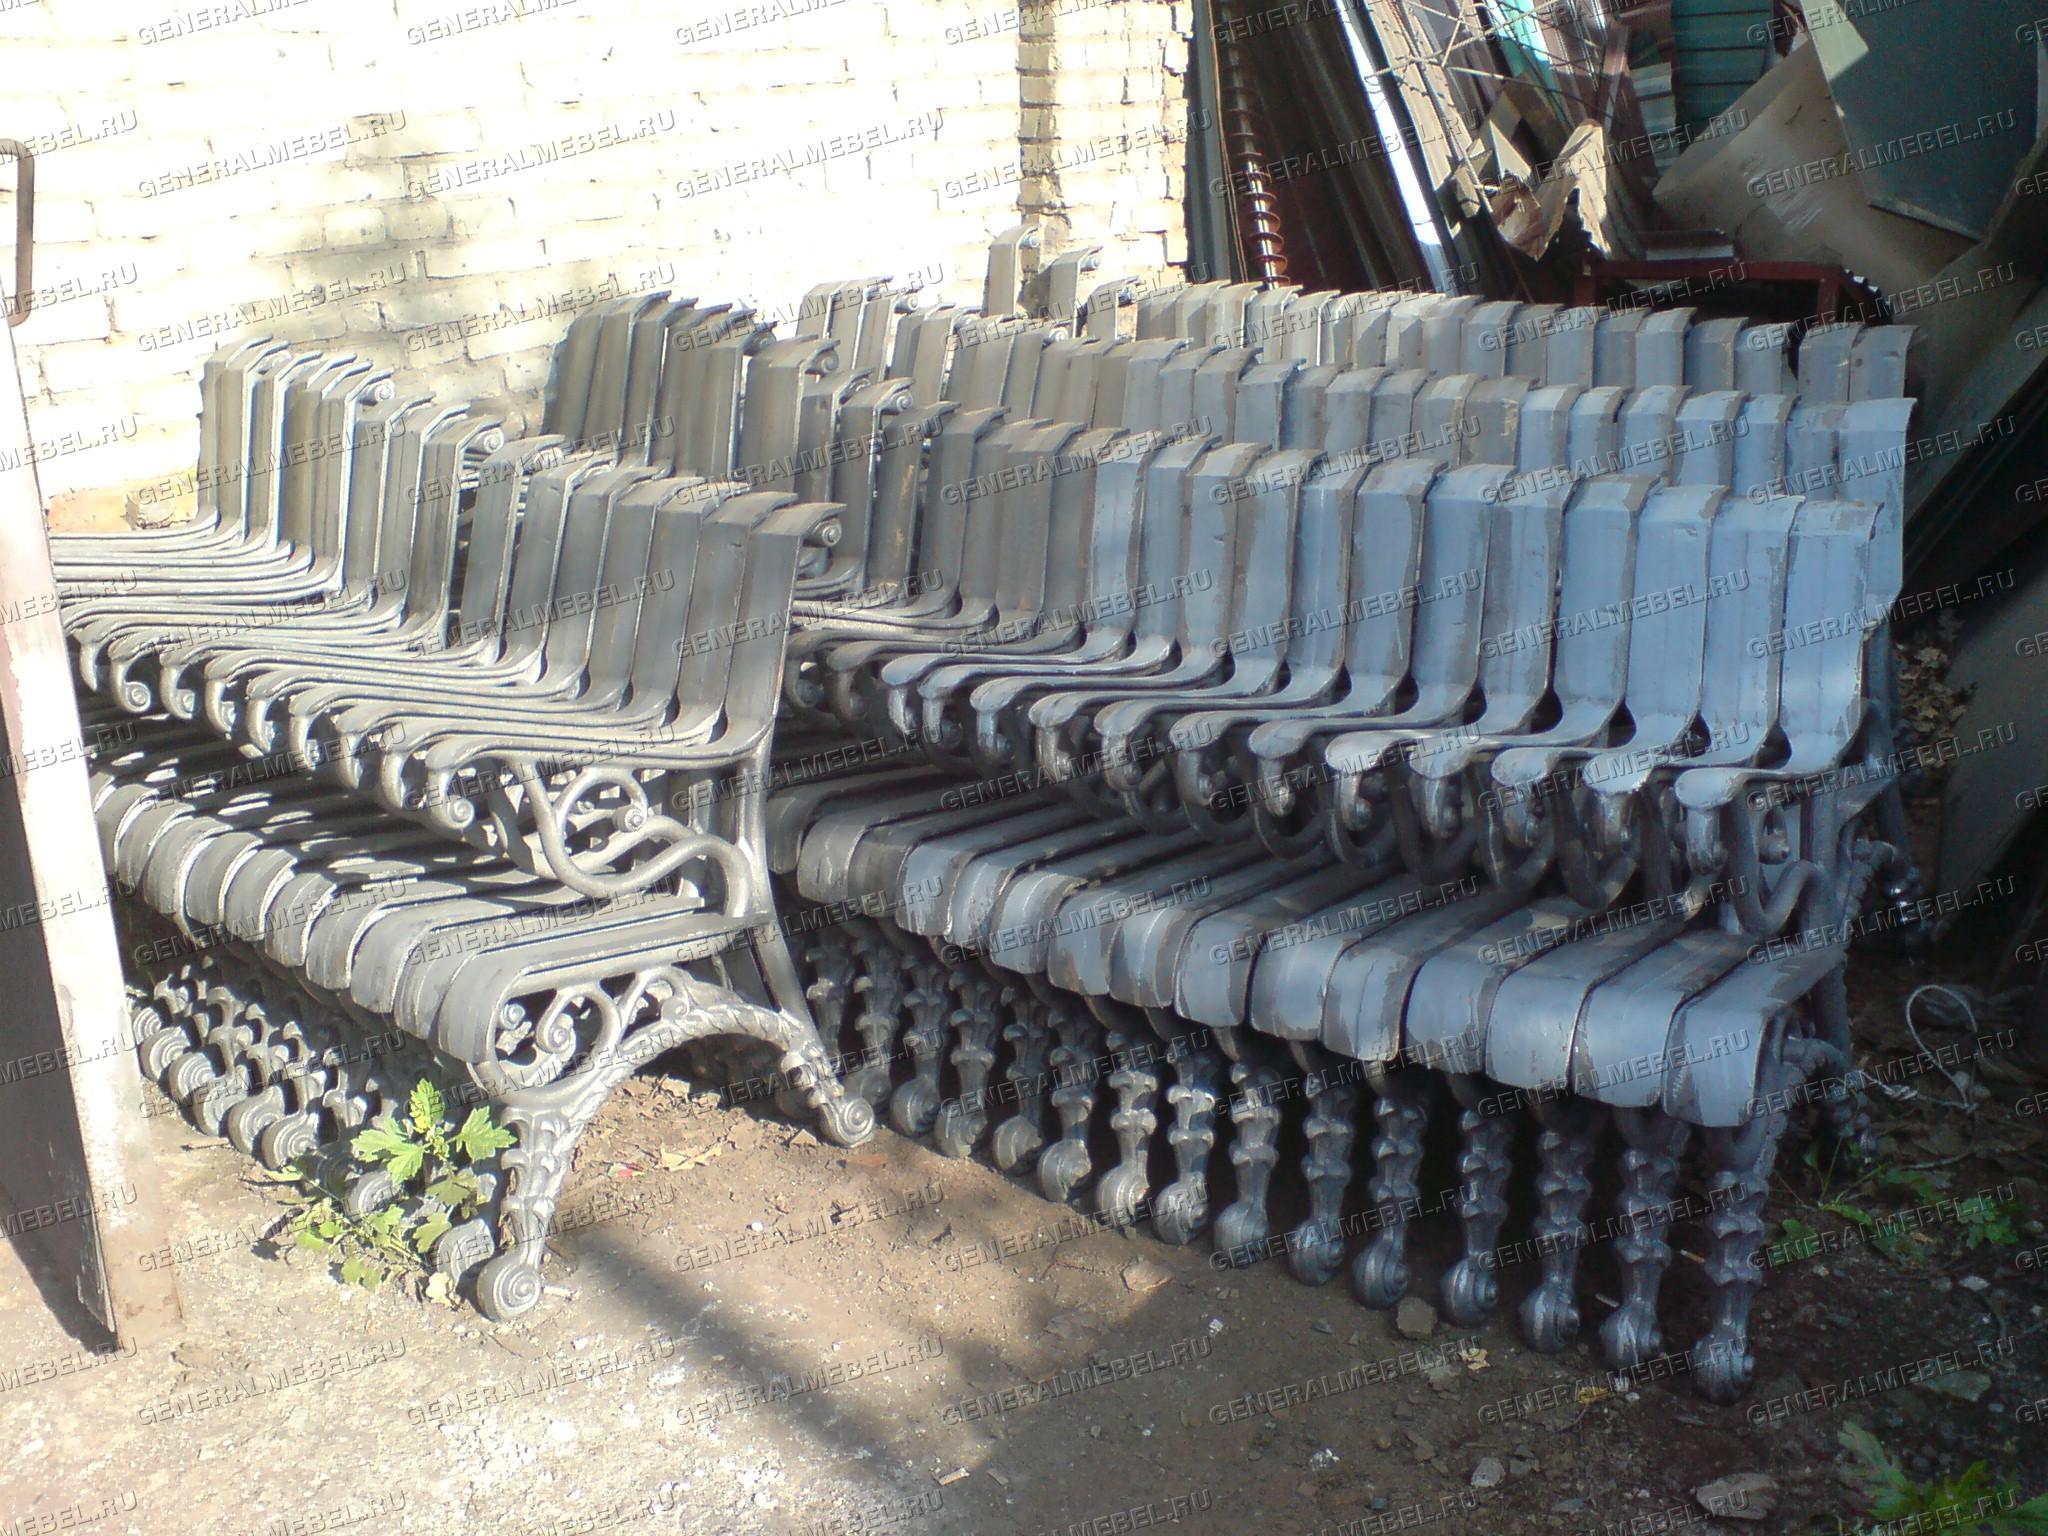 chugunnaia lavka скамейка садовая купить на заводе, фото боковин чугунных скамеек, литые лавки на дачу